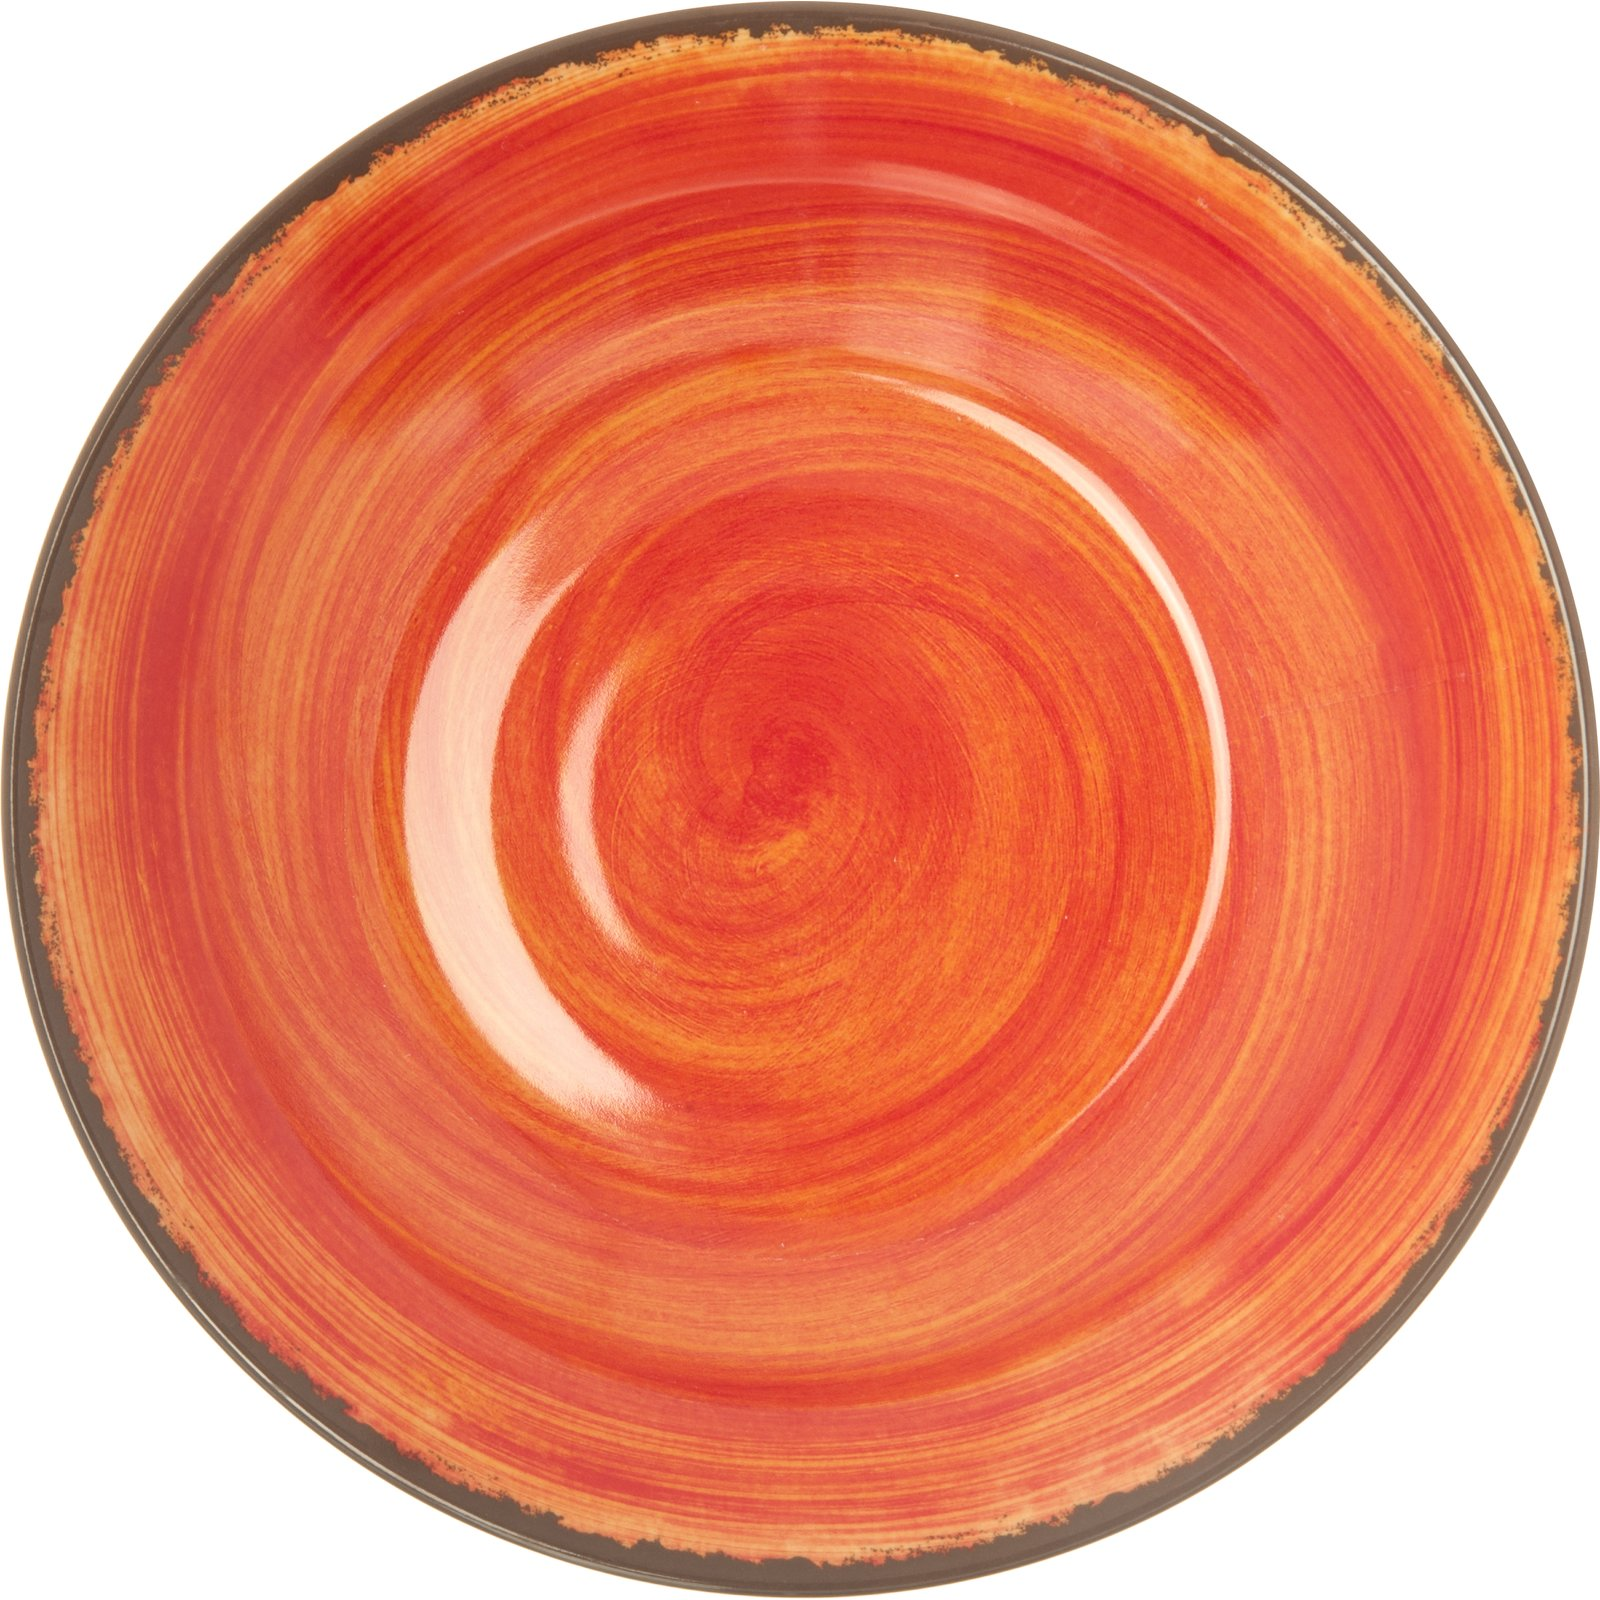 ... 5400352 - Mingle Melamine Rimmed Soup Bowl 28.5 oz - Fireball  sc 1 st  Carlisle FoodService Products & 5400352 - Mingle Melamine Rimmed Soup Bowl 28.5 oz - Fireball ...